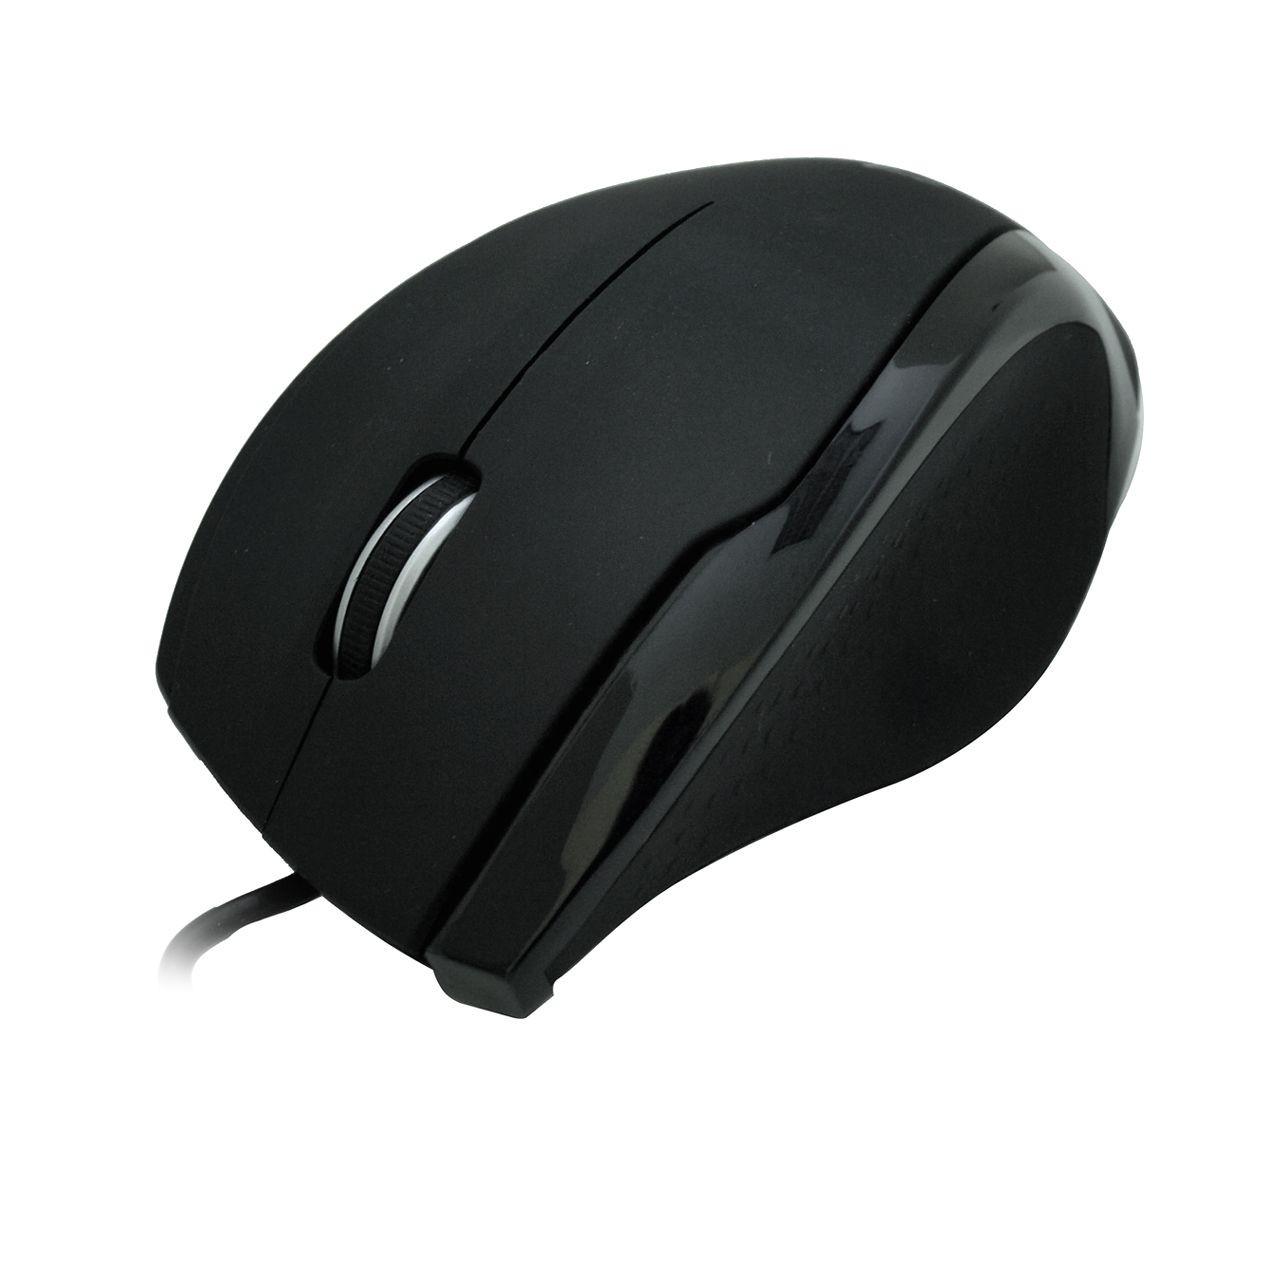 ART mysz AM-61X Revolution USB+PS/2